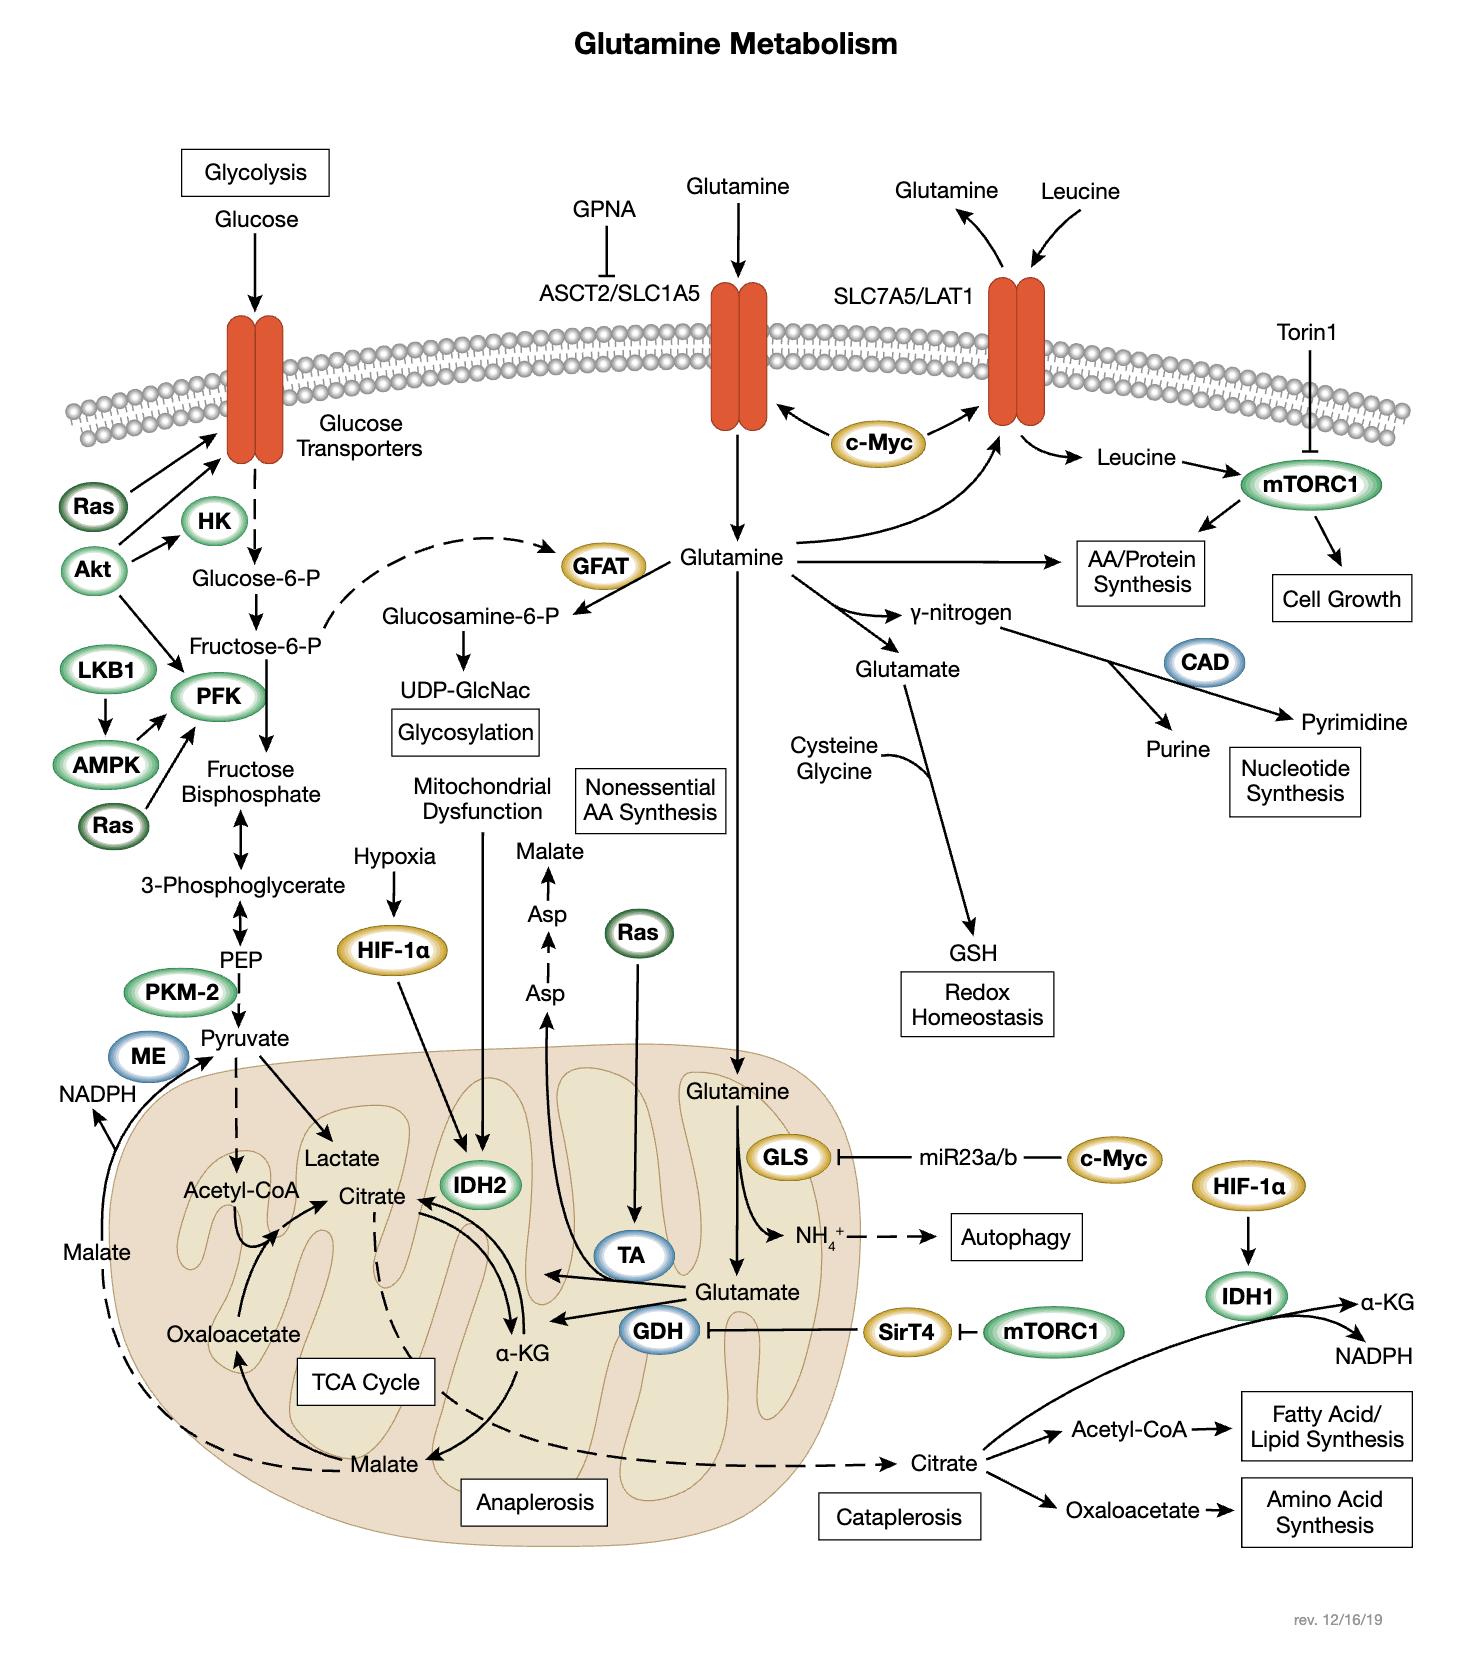 Glutamine Metabolism Interactive Signaling Pathway